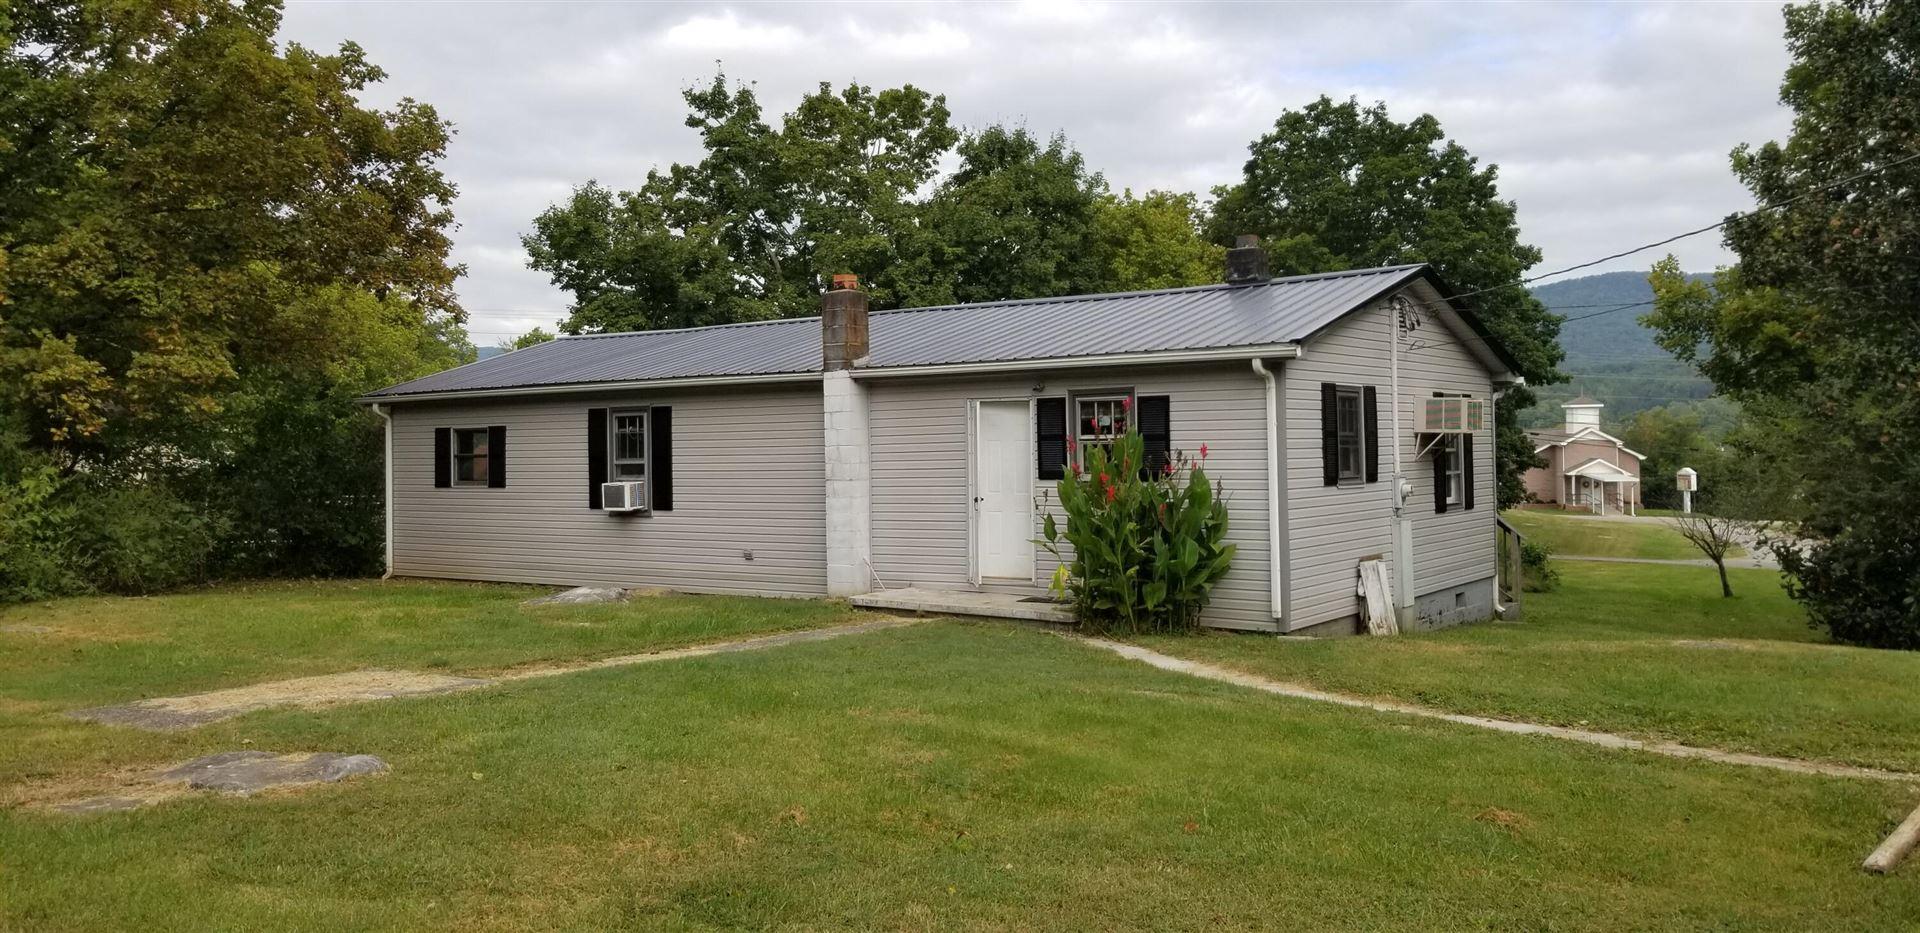 Photo of 130 Southside Ave, Rutledge, TN 37861 (MLS # 1167862)